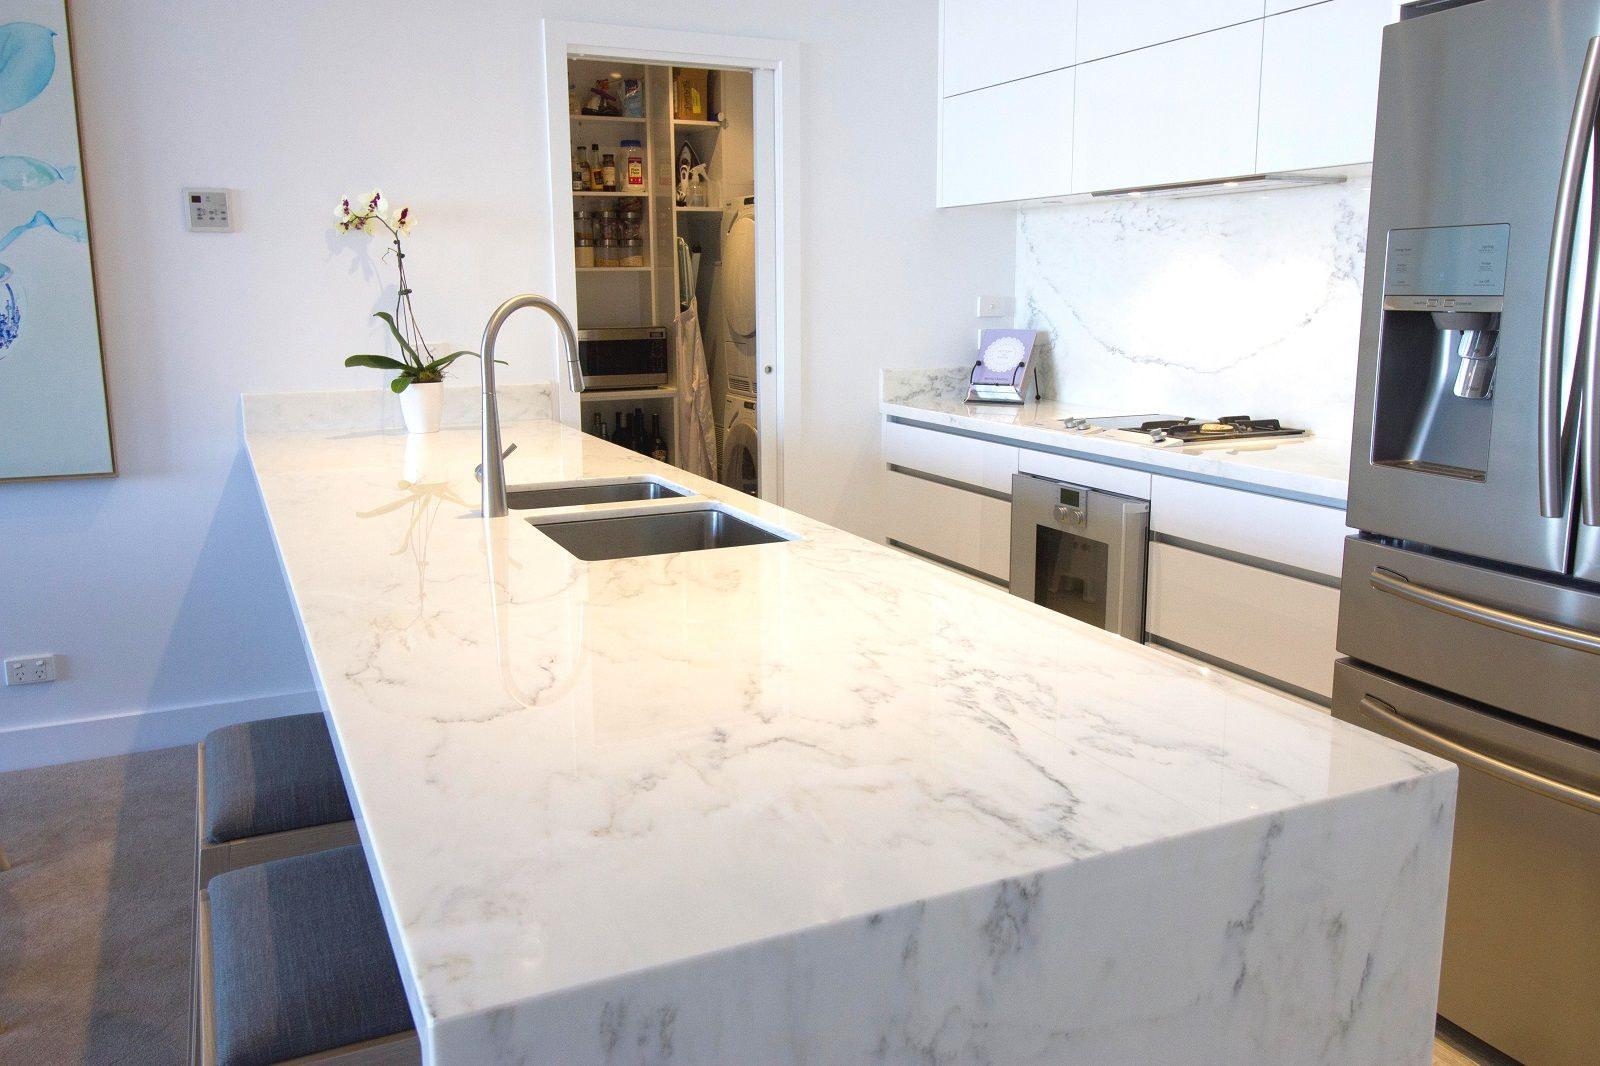 east melbourne the kitchen design centre tkdc wonga park tara | Home ...